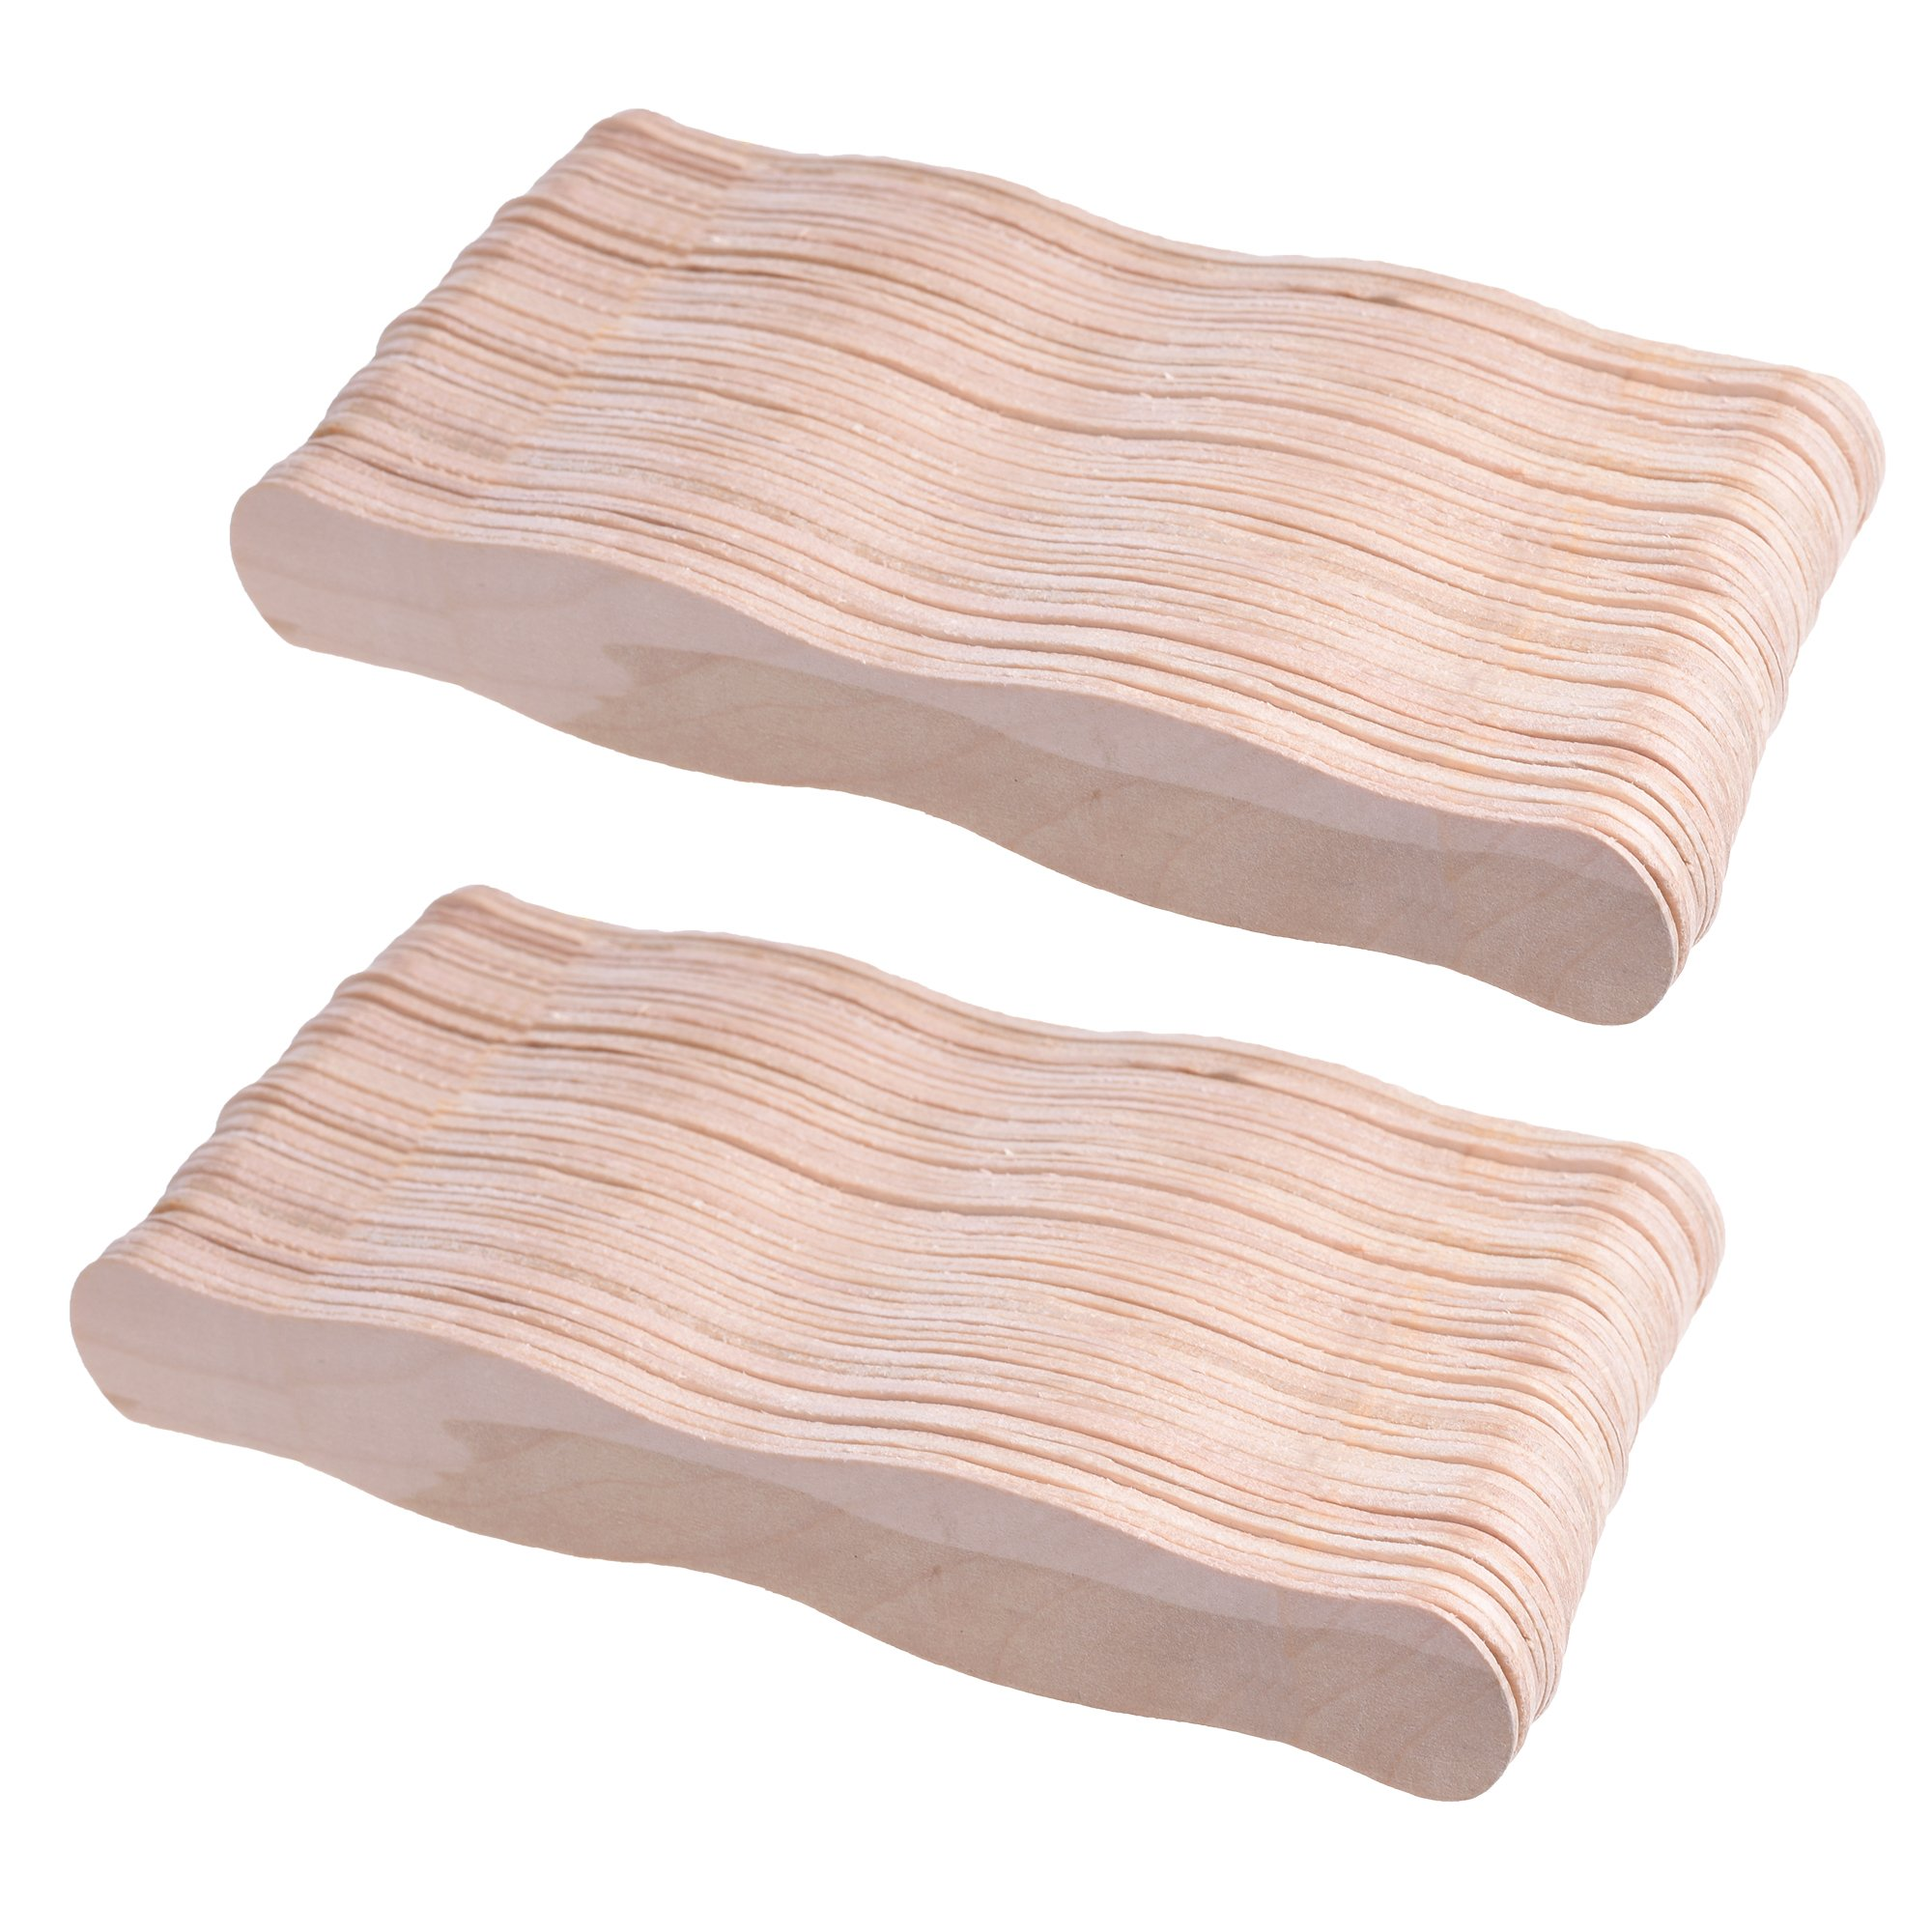 Cosmos 100 Pcs Natural Wavy Jumbo Wood Wedding Fan Handles Craft Sticks 8 inches